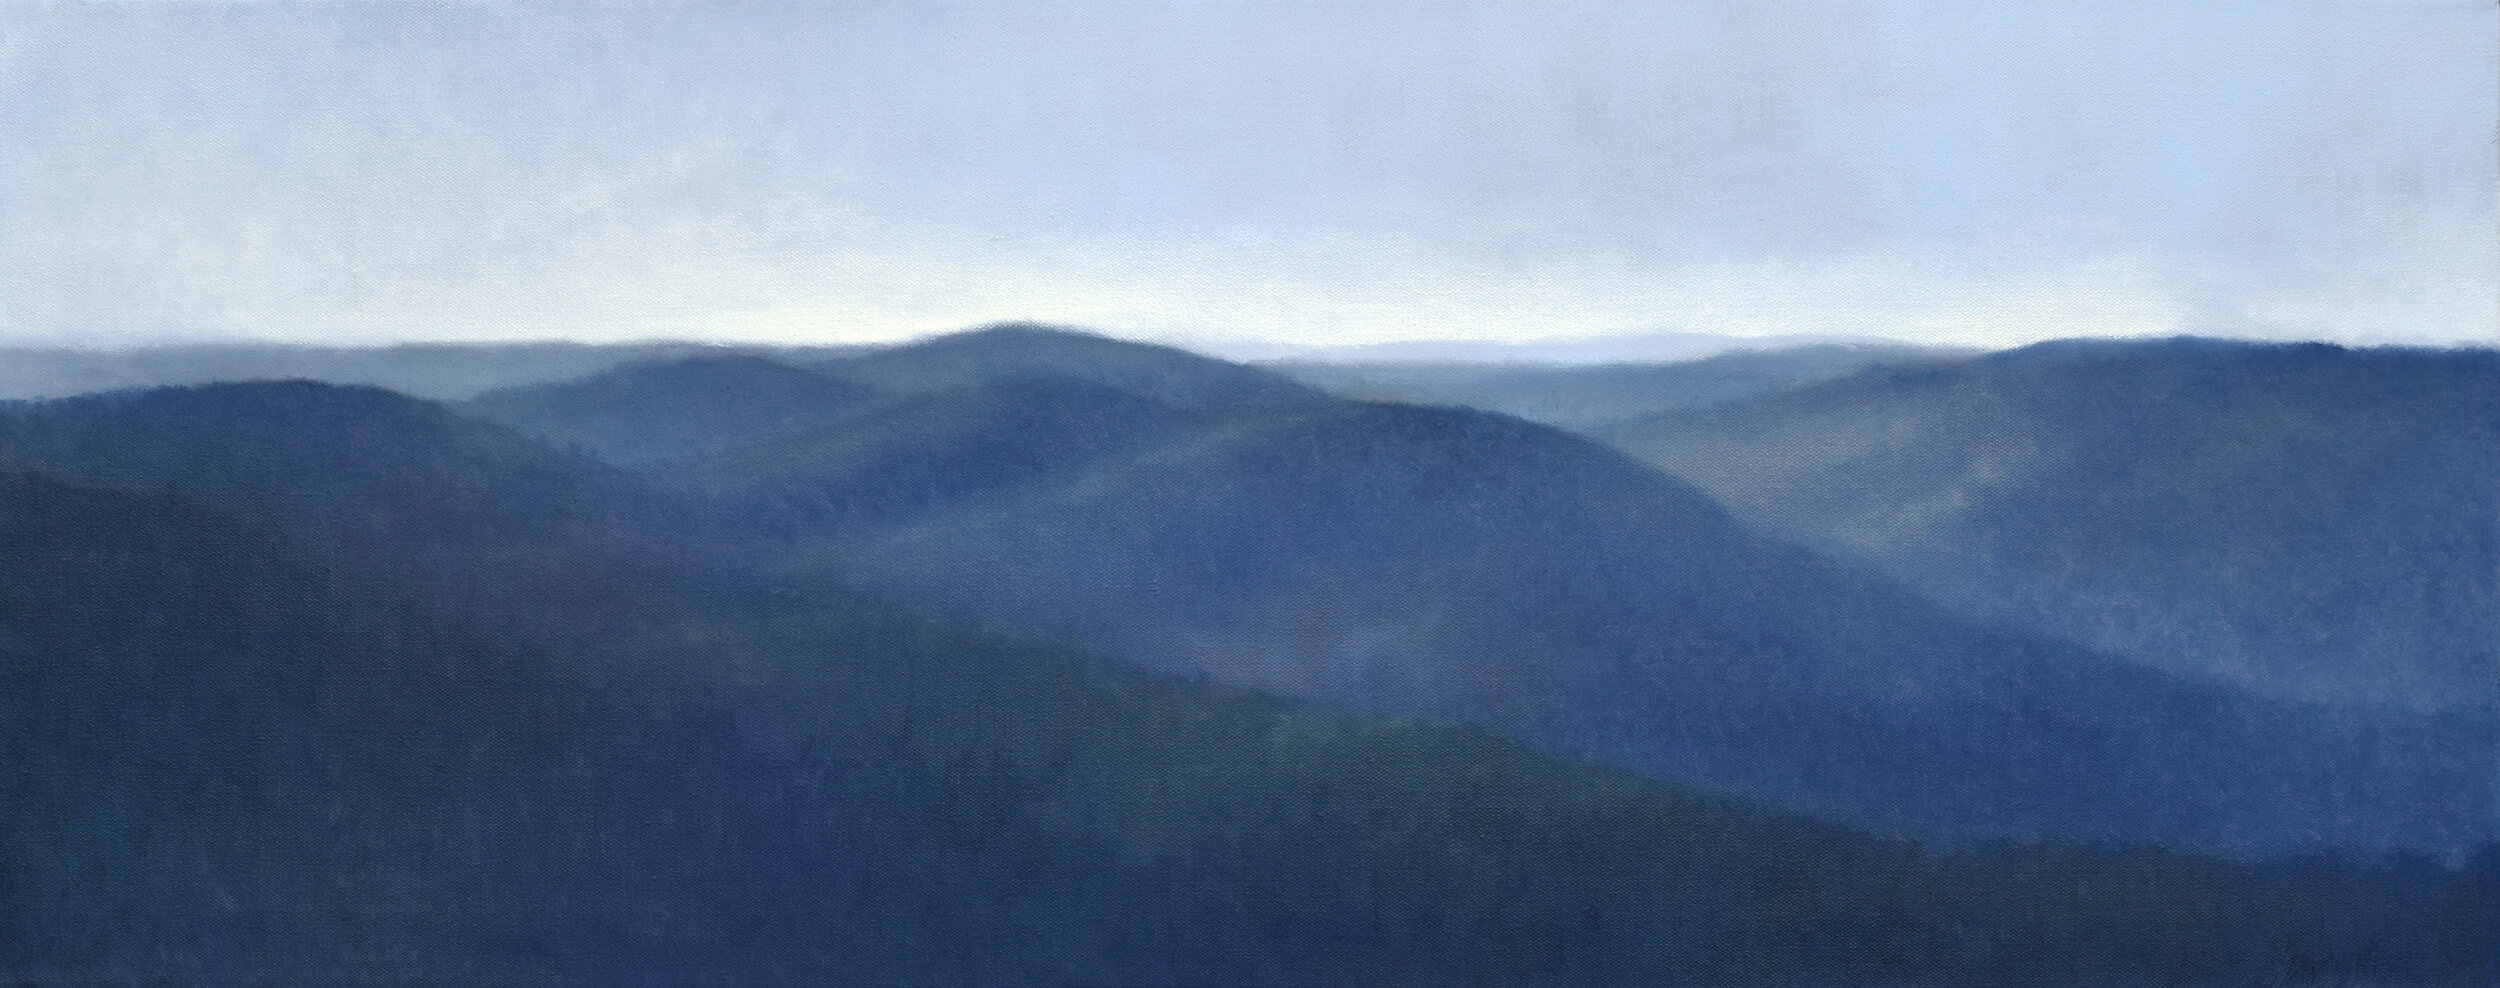 Mountaintop I